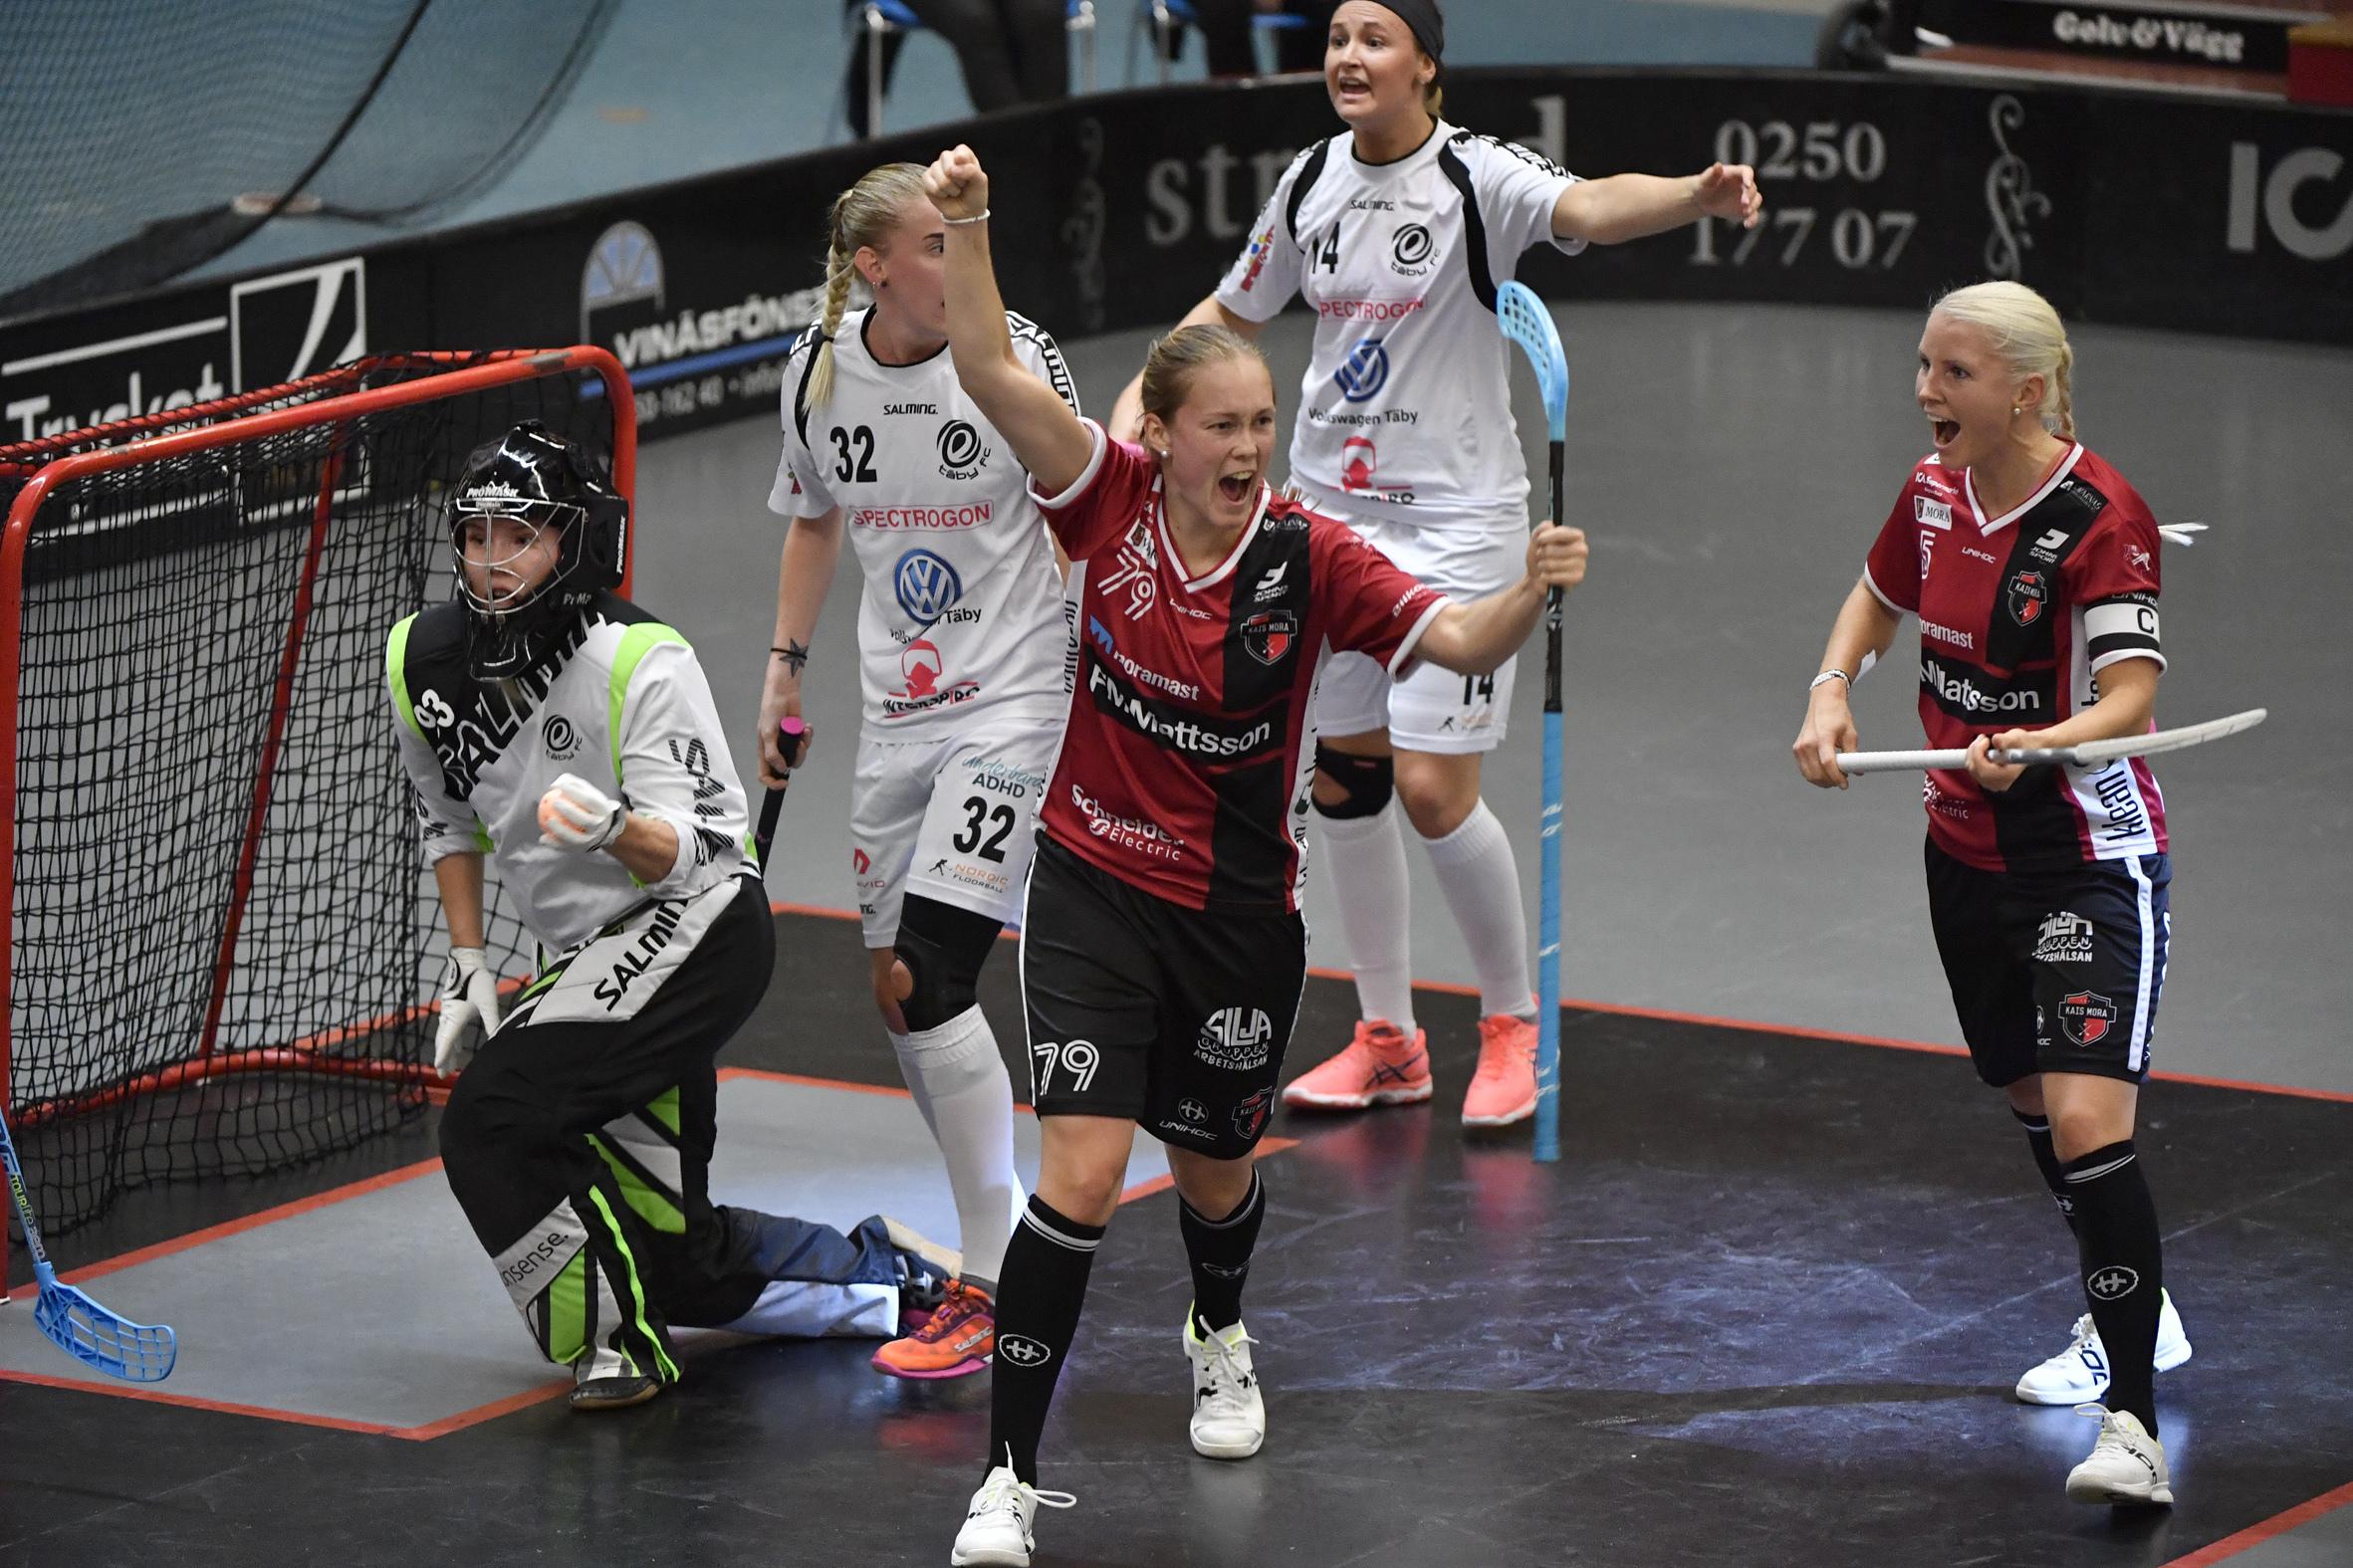 Mora vann seriefinalen